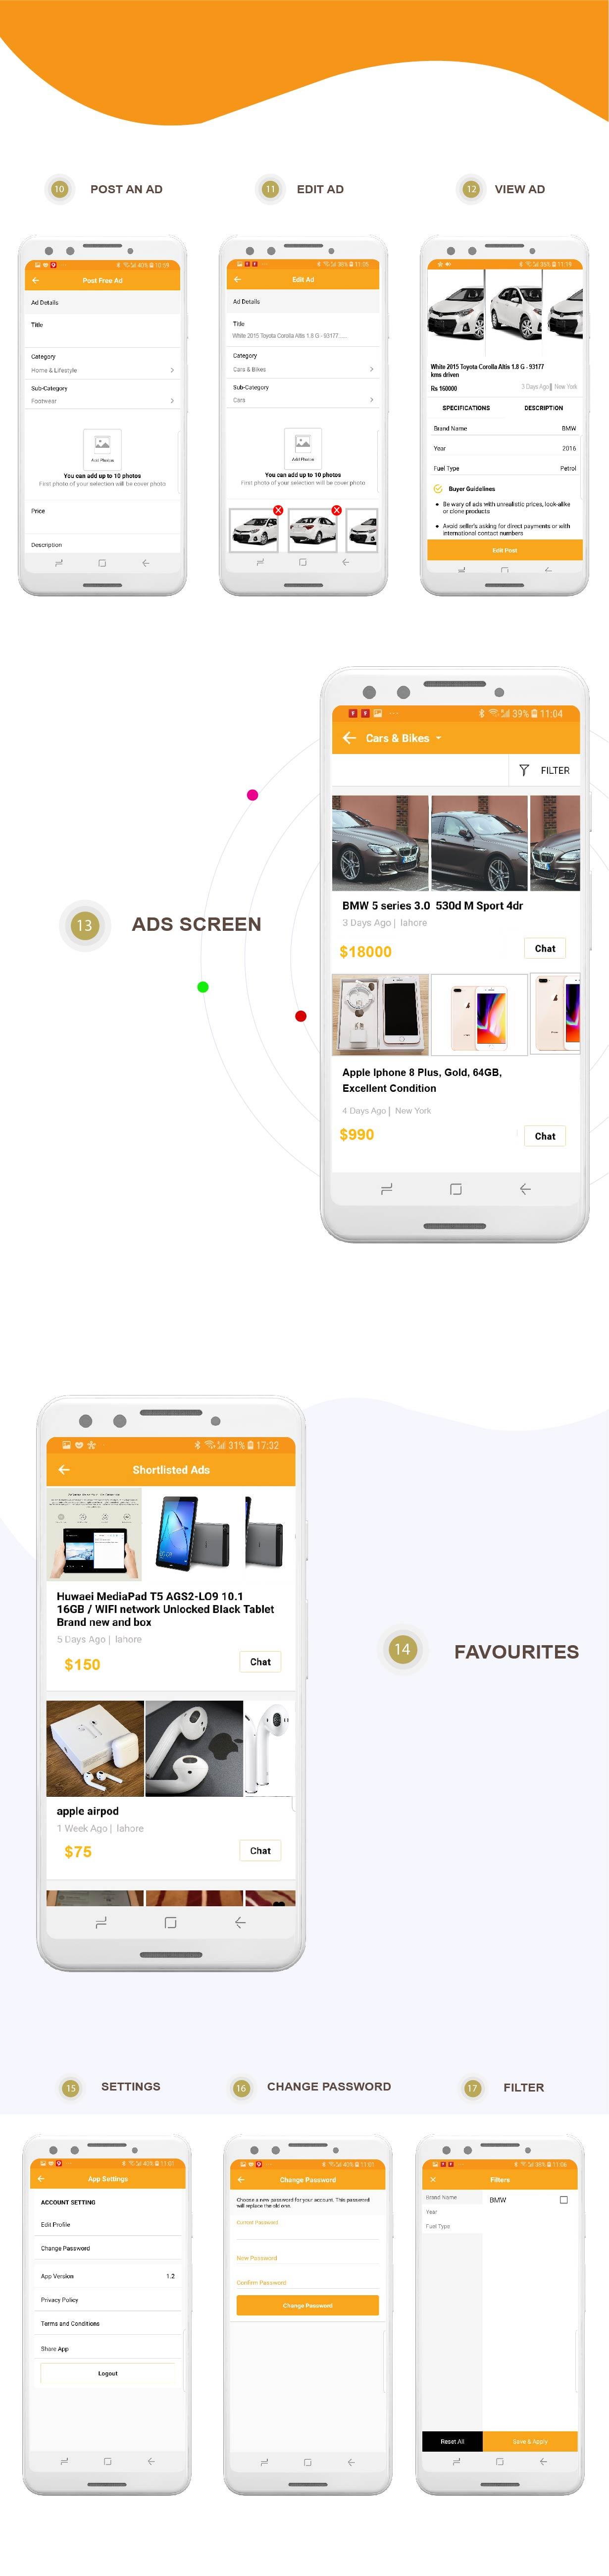 Advilla - Classified Android Native App v1.0.1 - 4